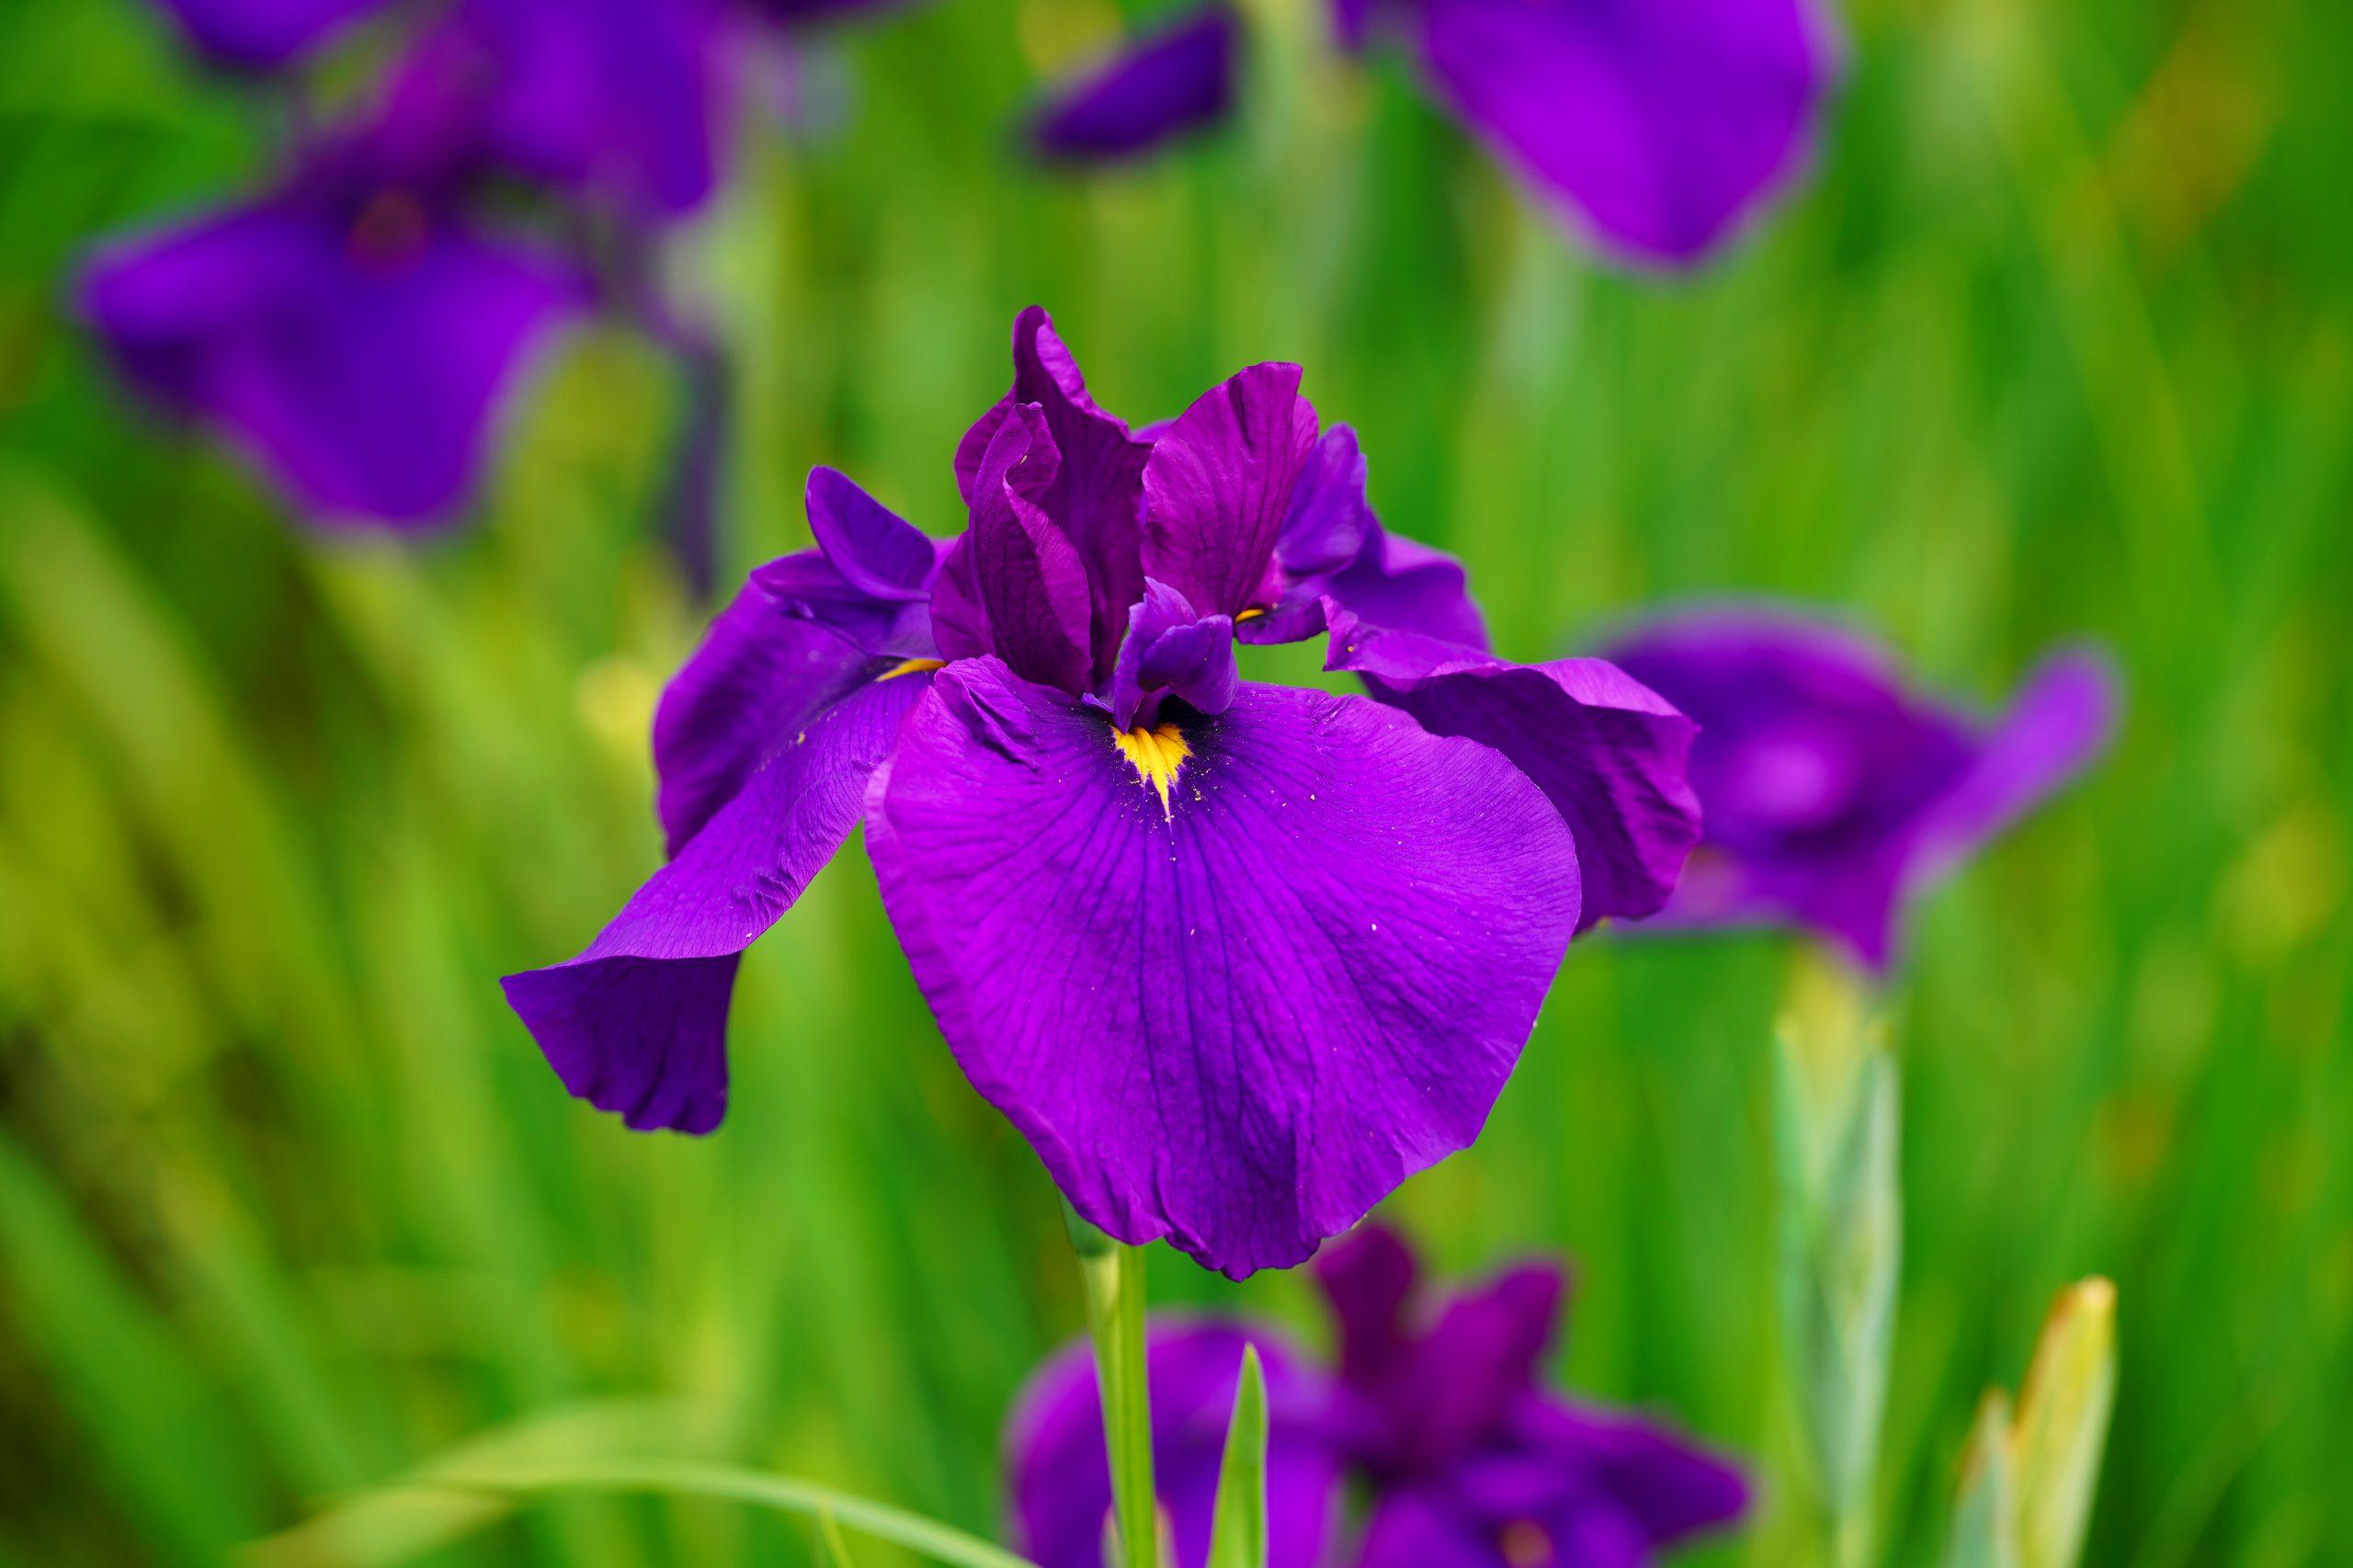 【SONY】この季節に咲く花(28)